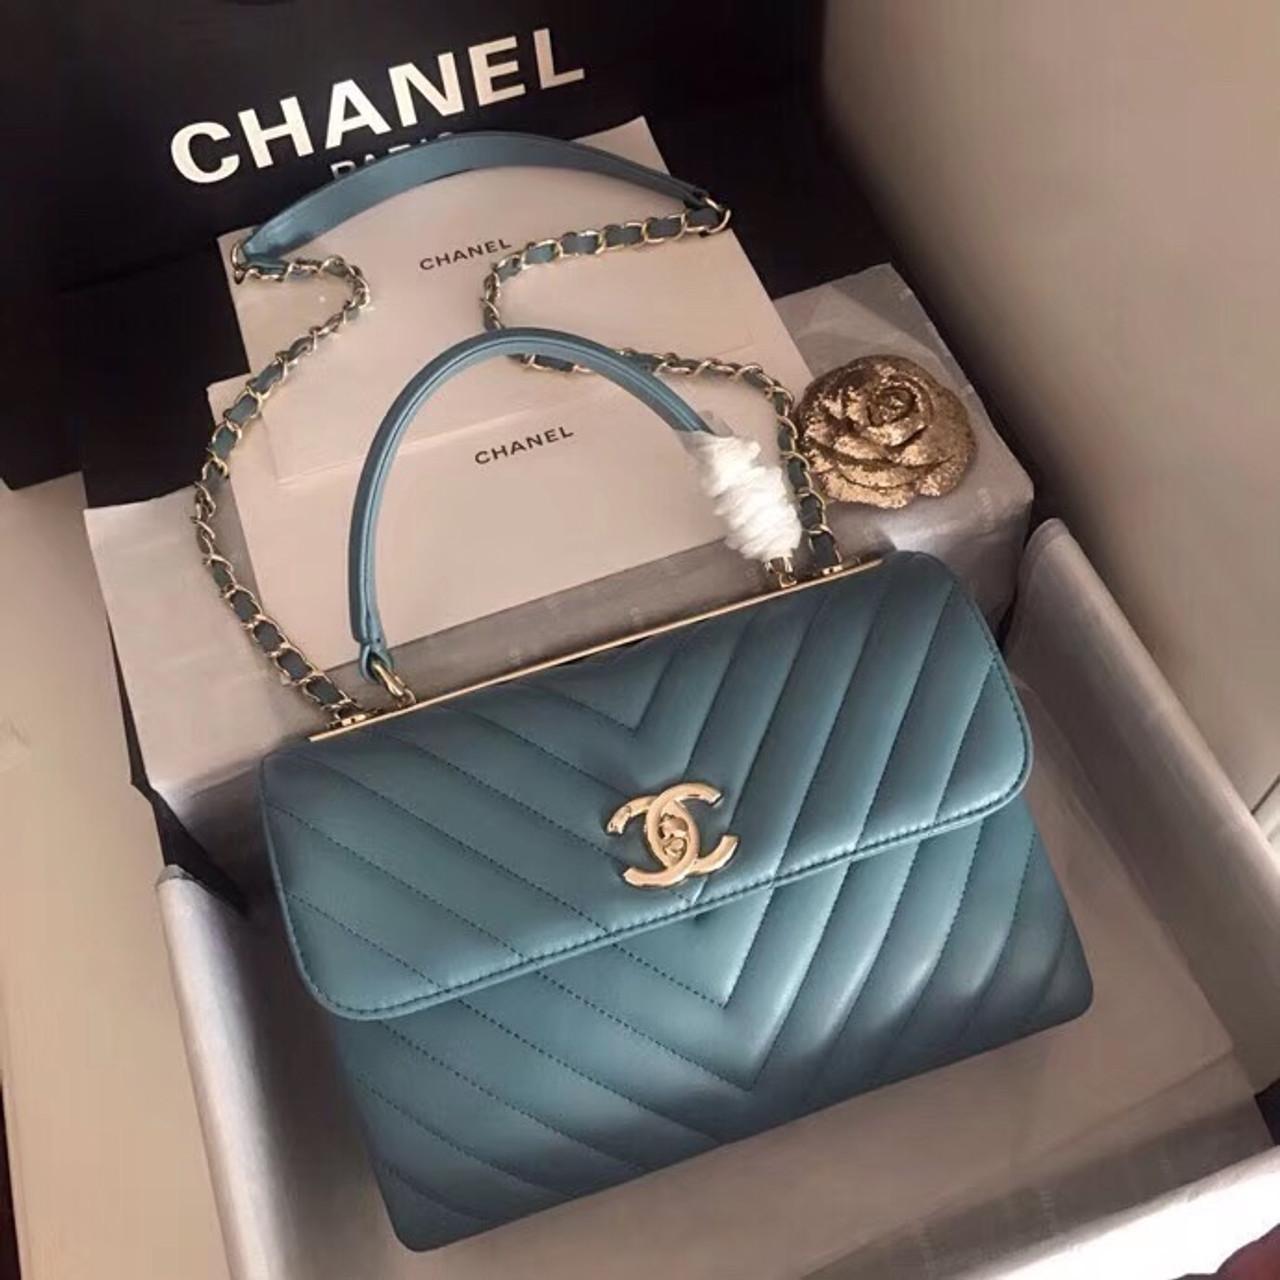 896c766ba797 Chanel Small Flap Bag With Top Handle 2019 A69923 Blue - Bella Vita Moda